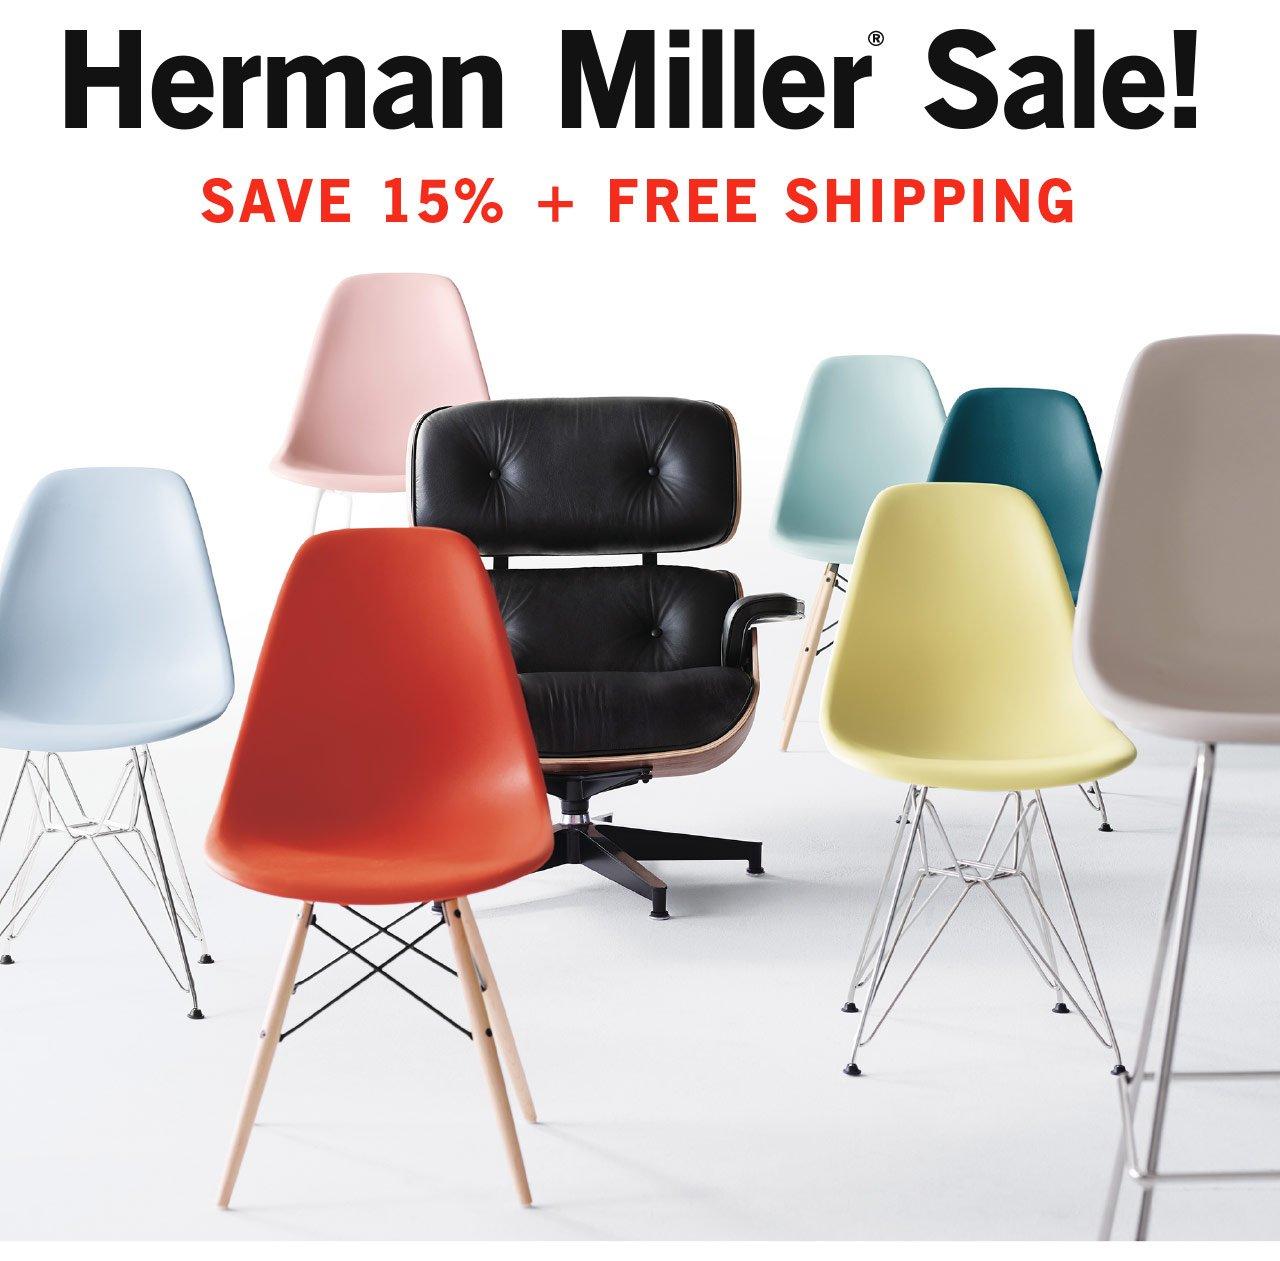 Herman Miller Sale